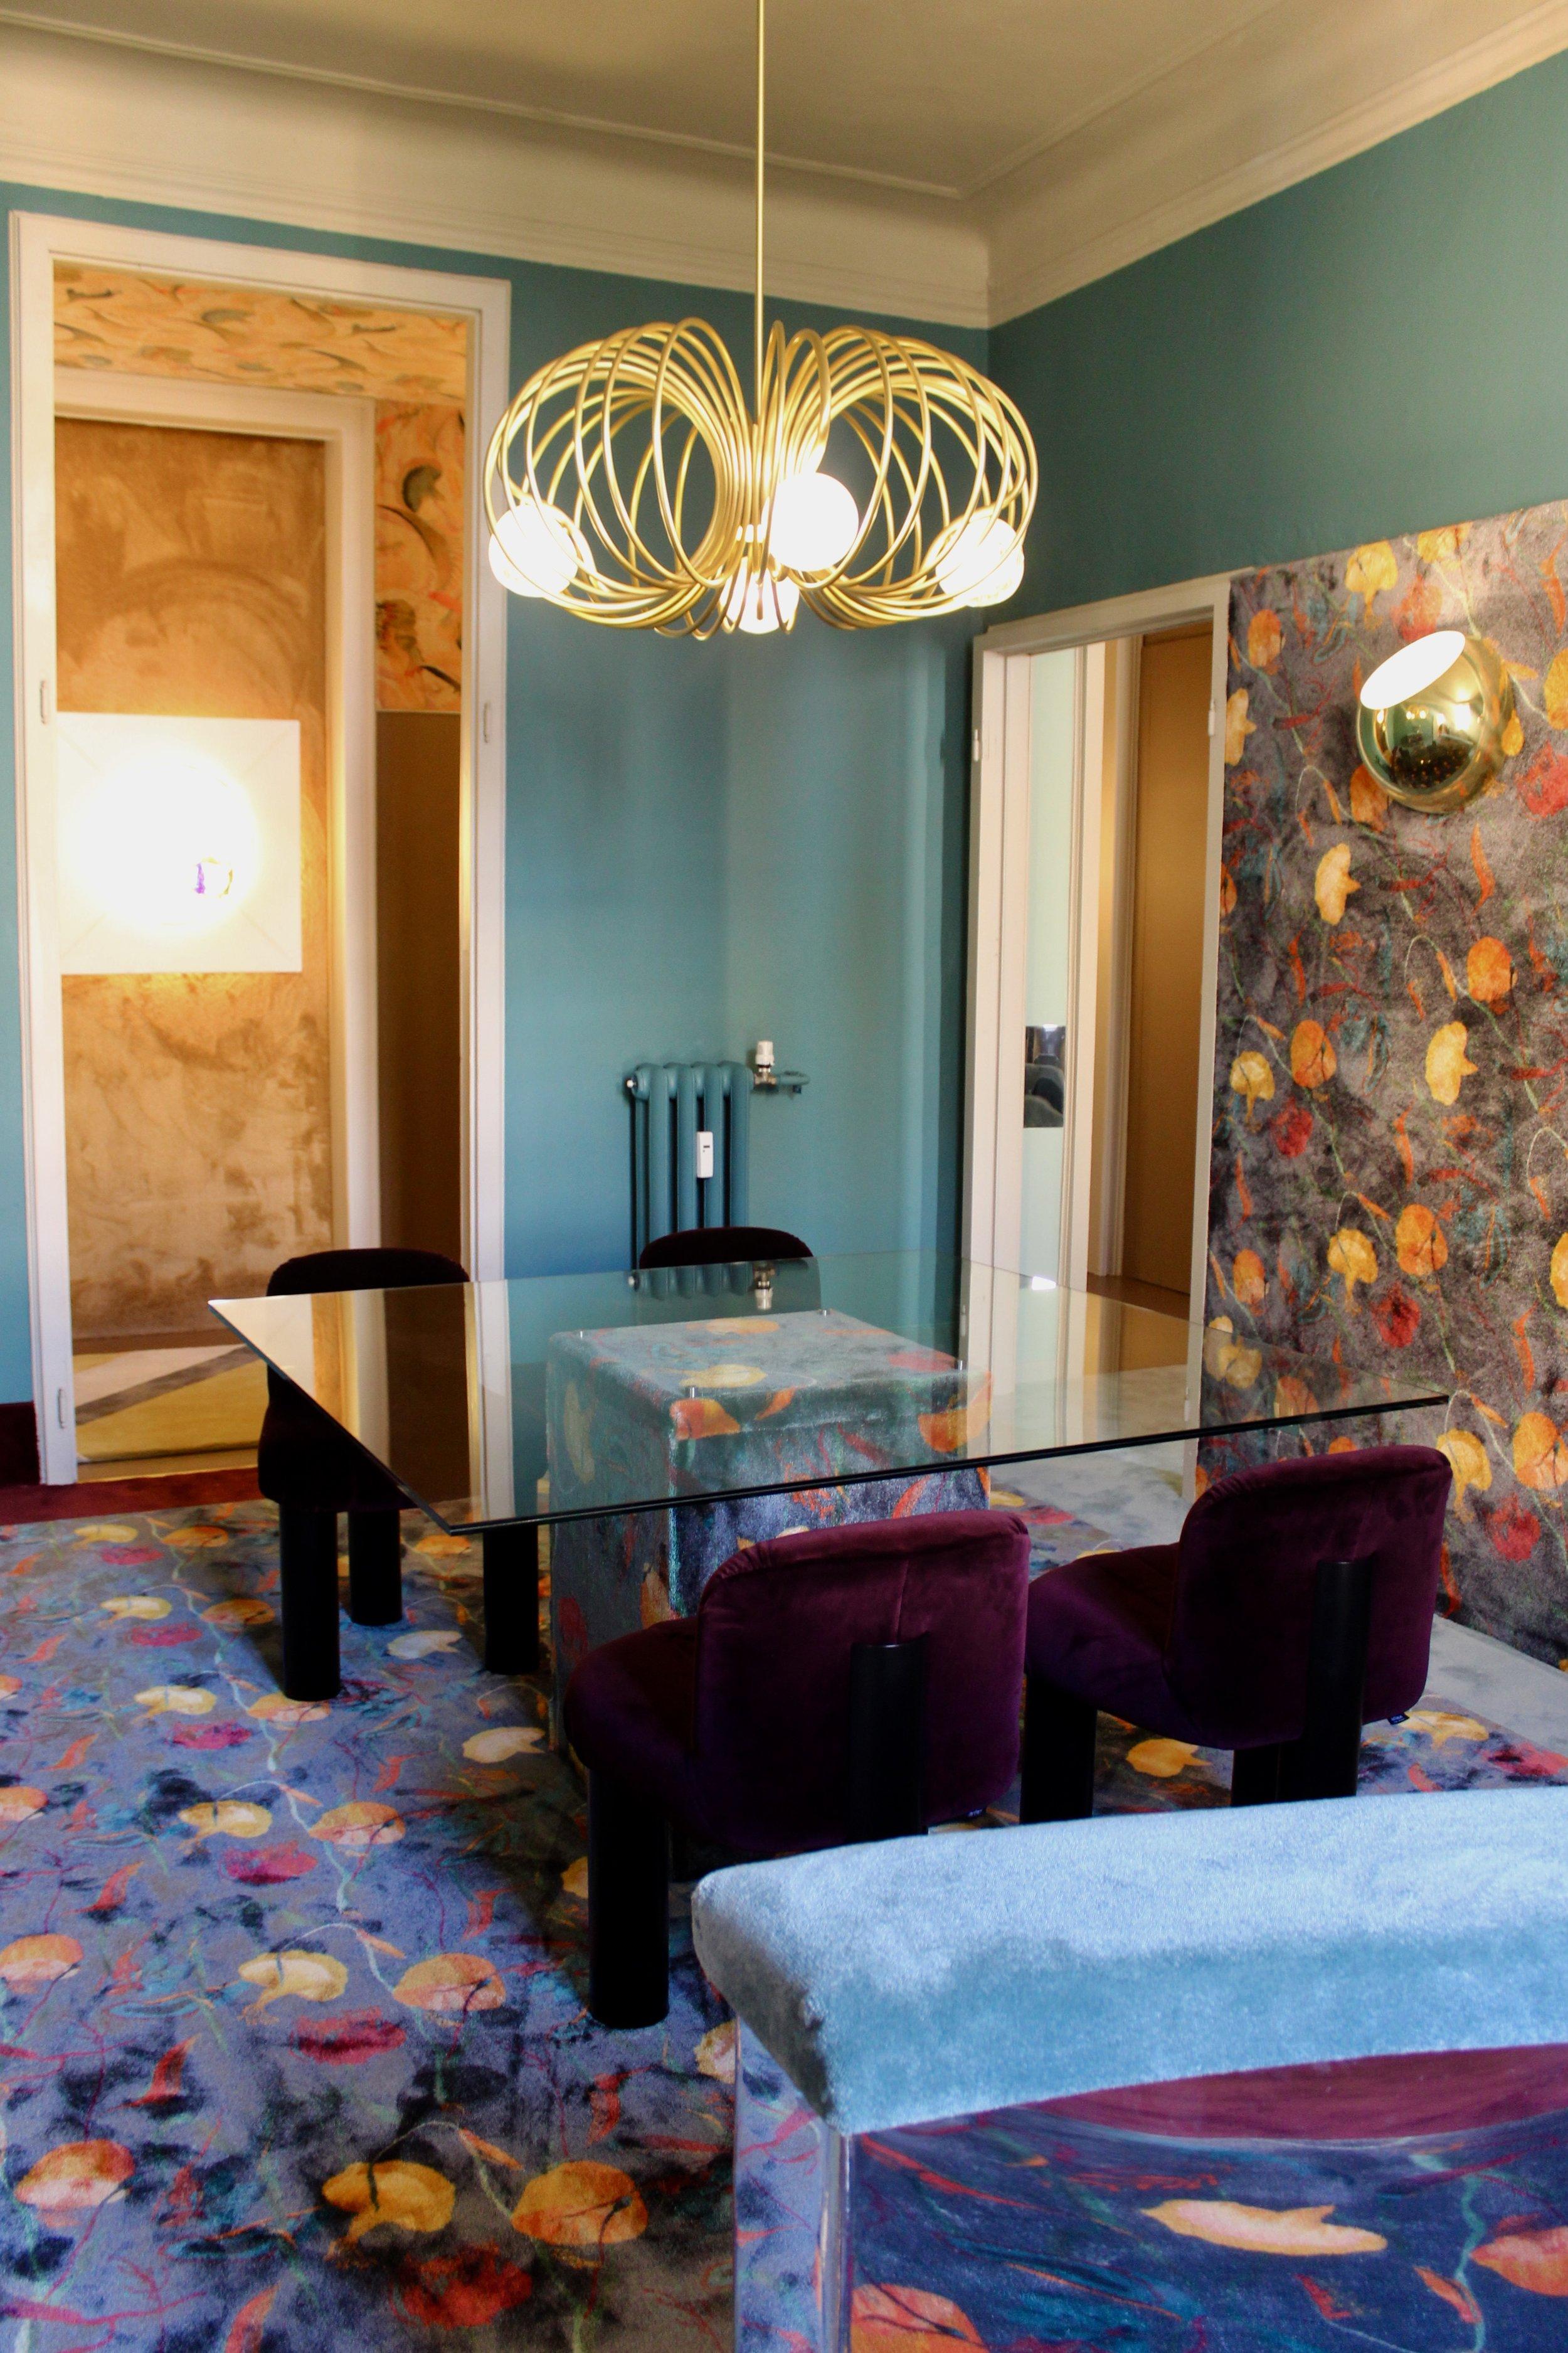 Brera Design Apartment by Cristina Celestino photography thatssocool